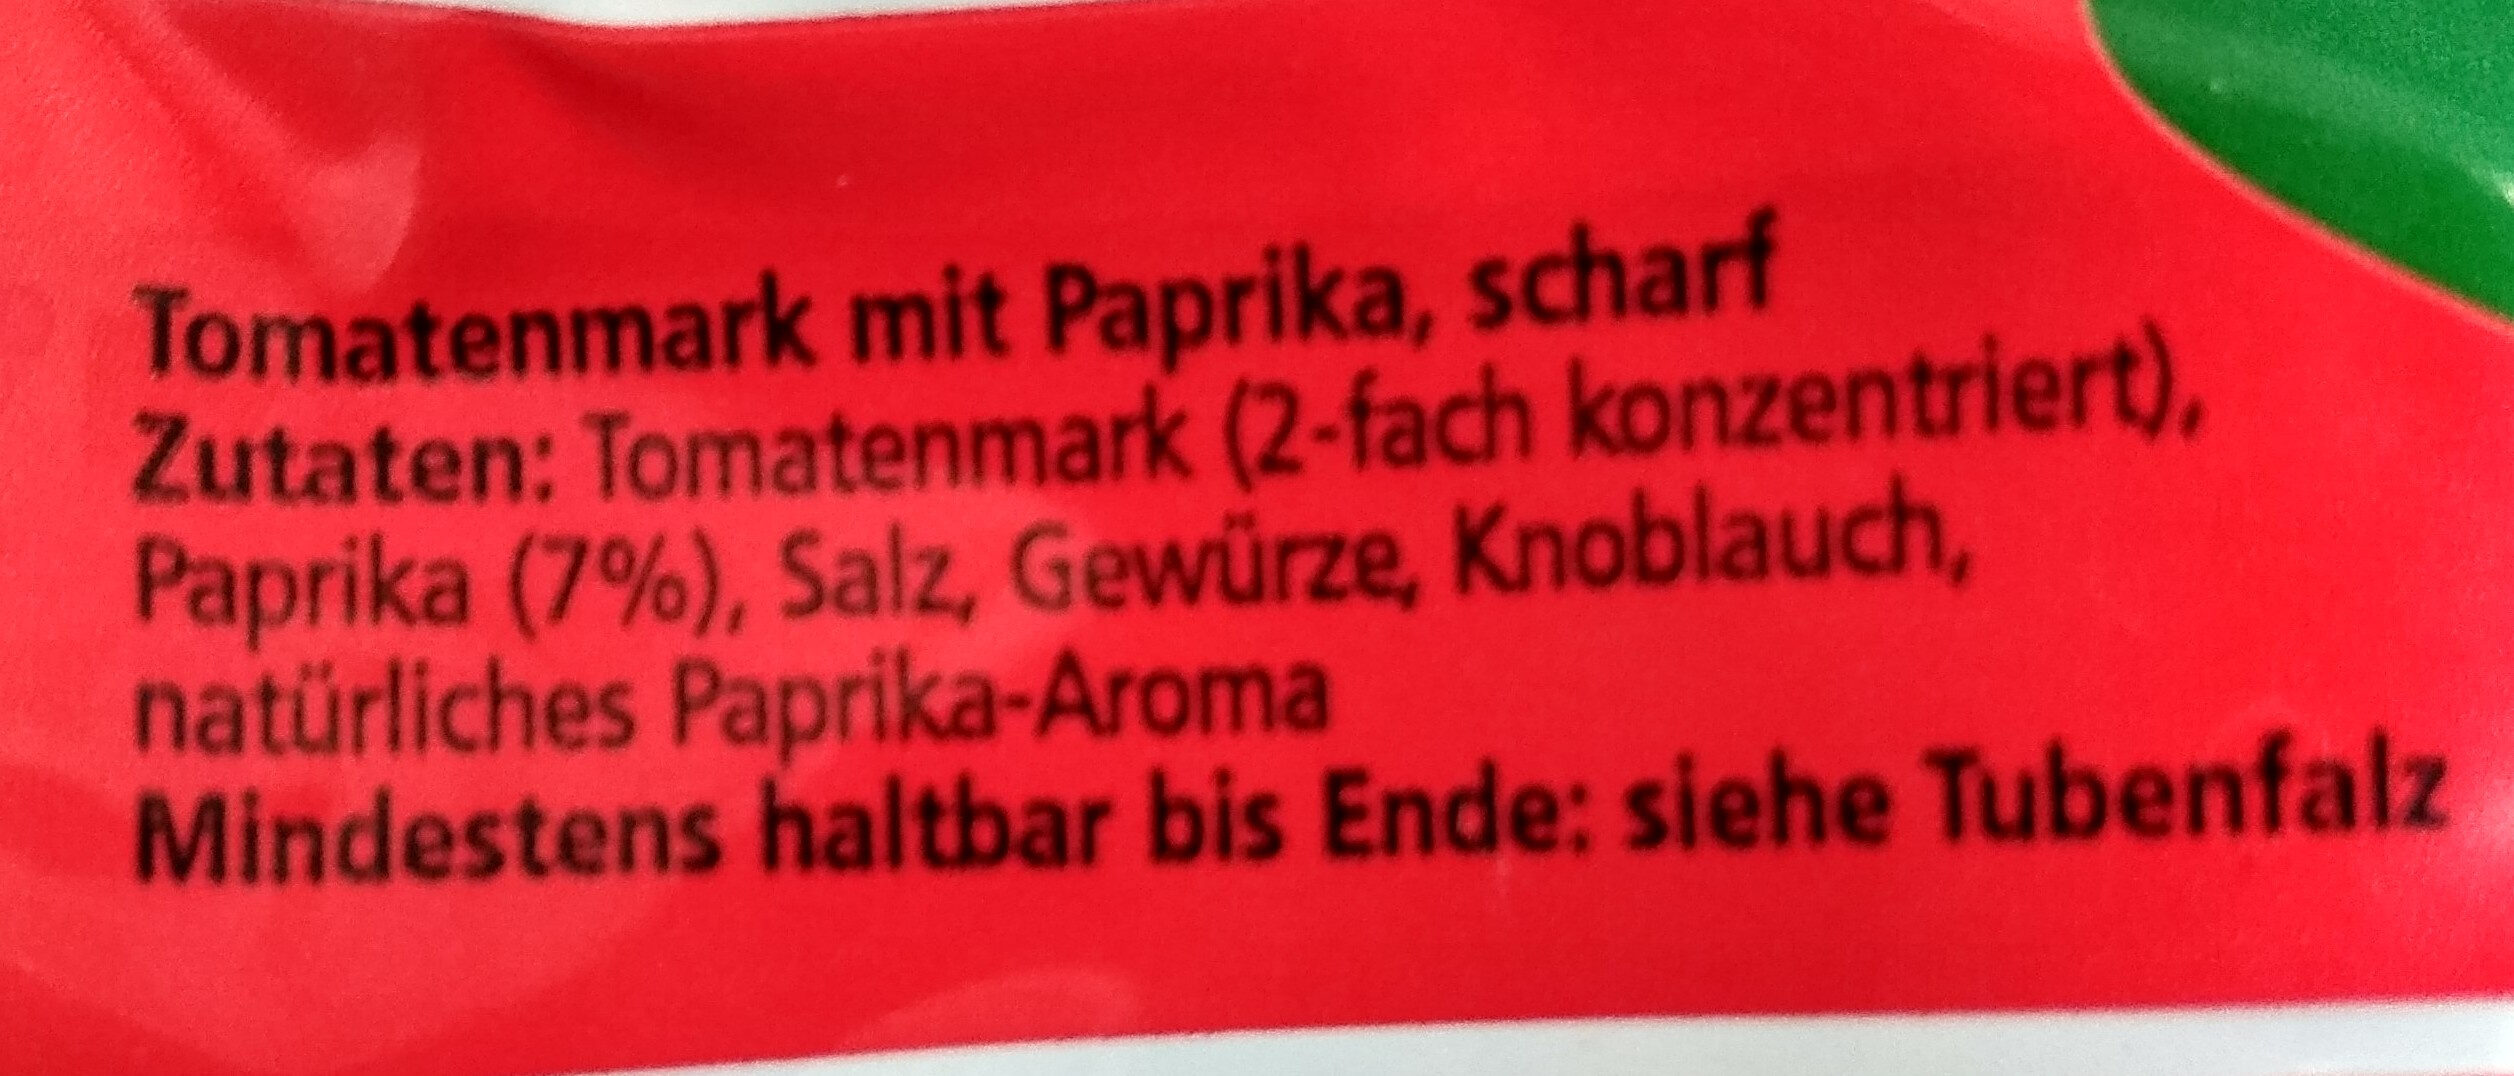 Tomatenmark scharf - Ingrédients - de